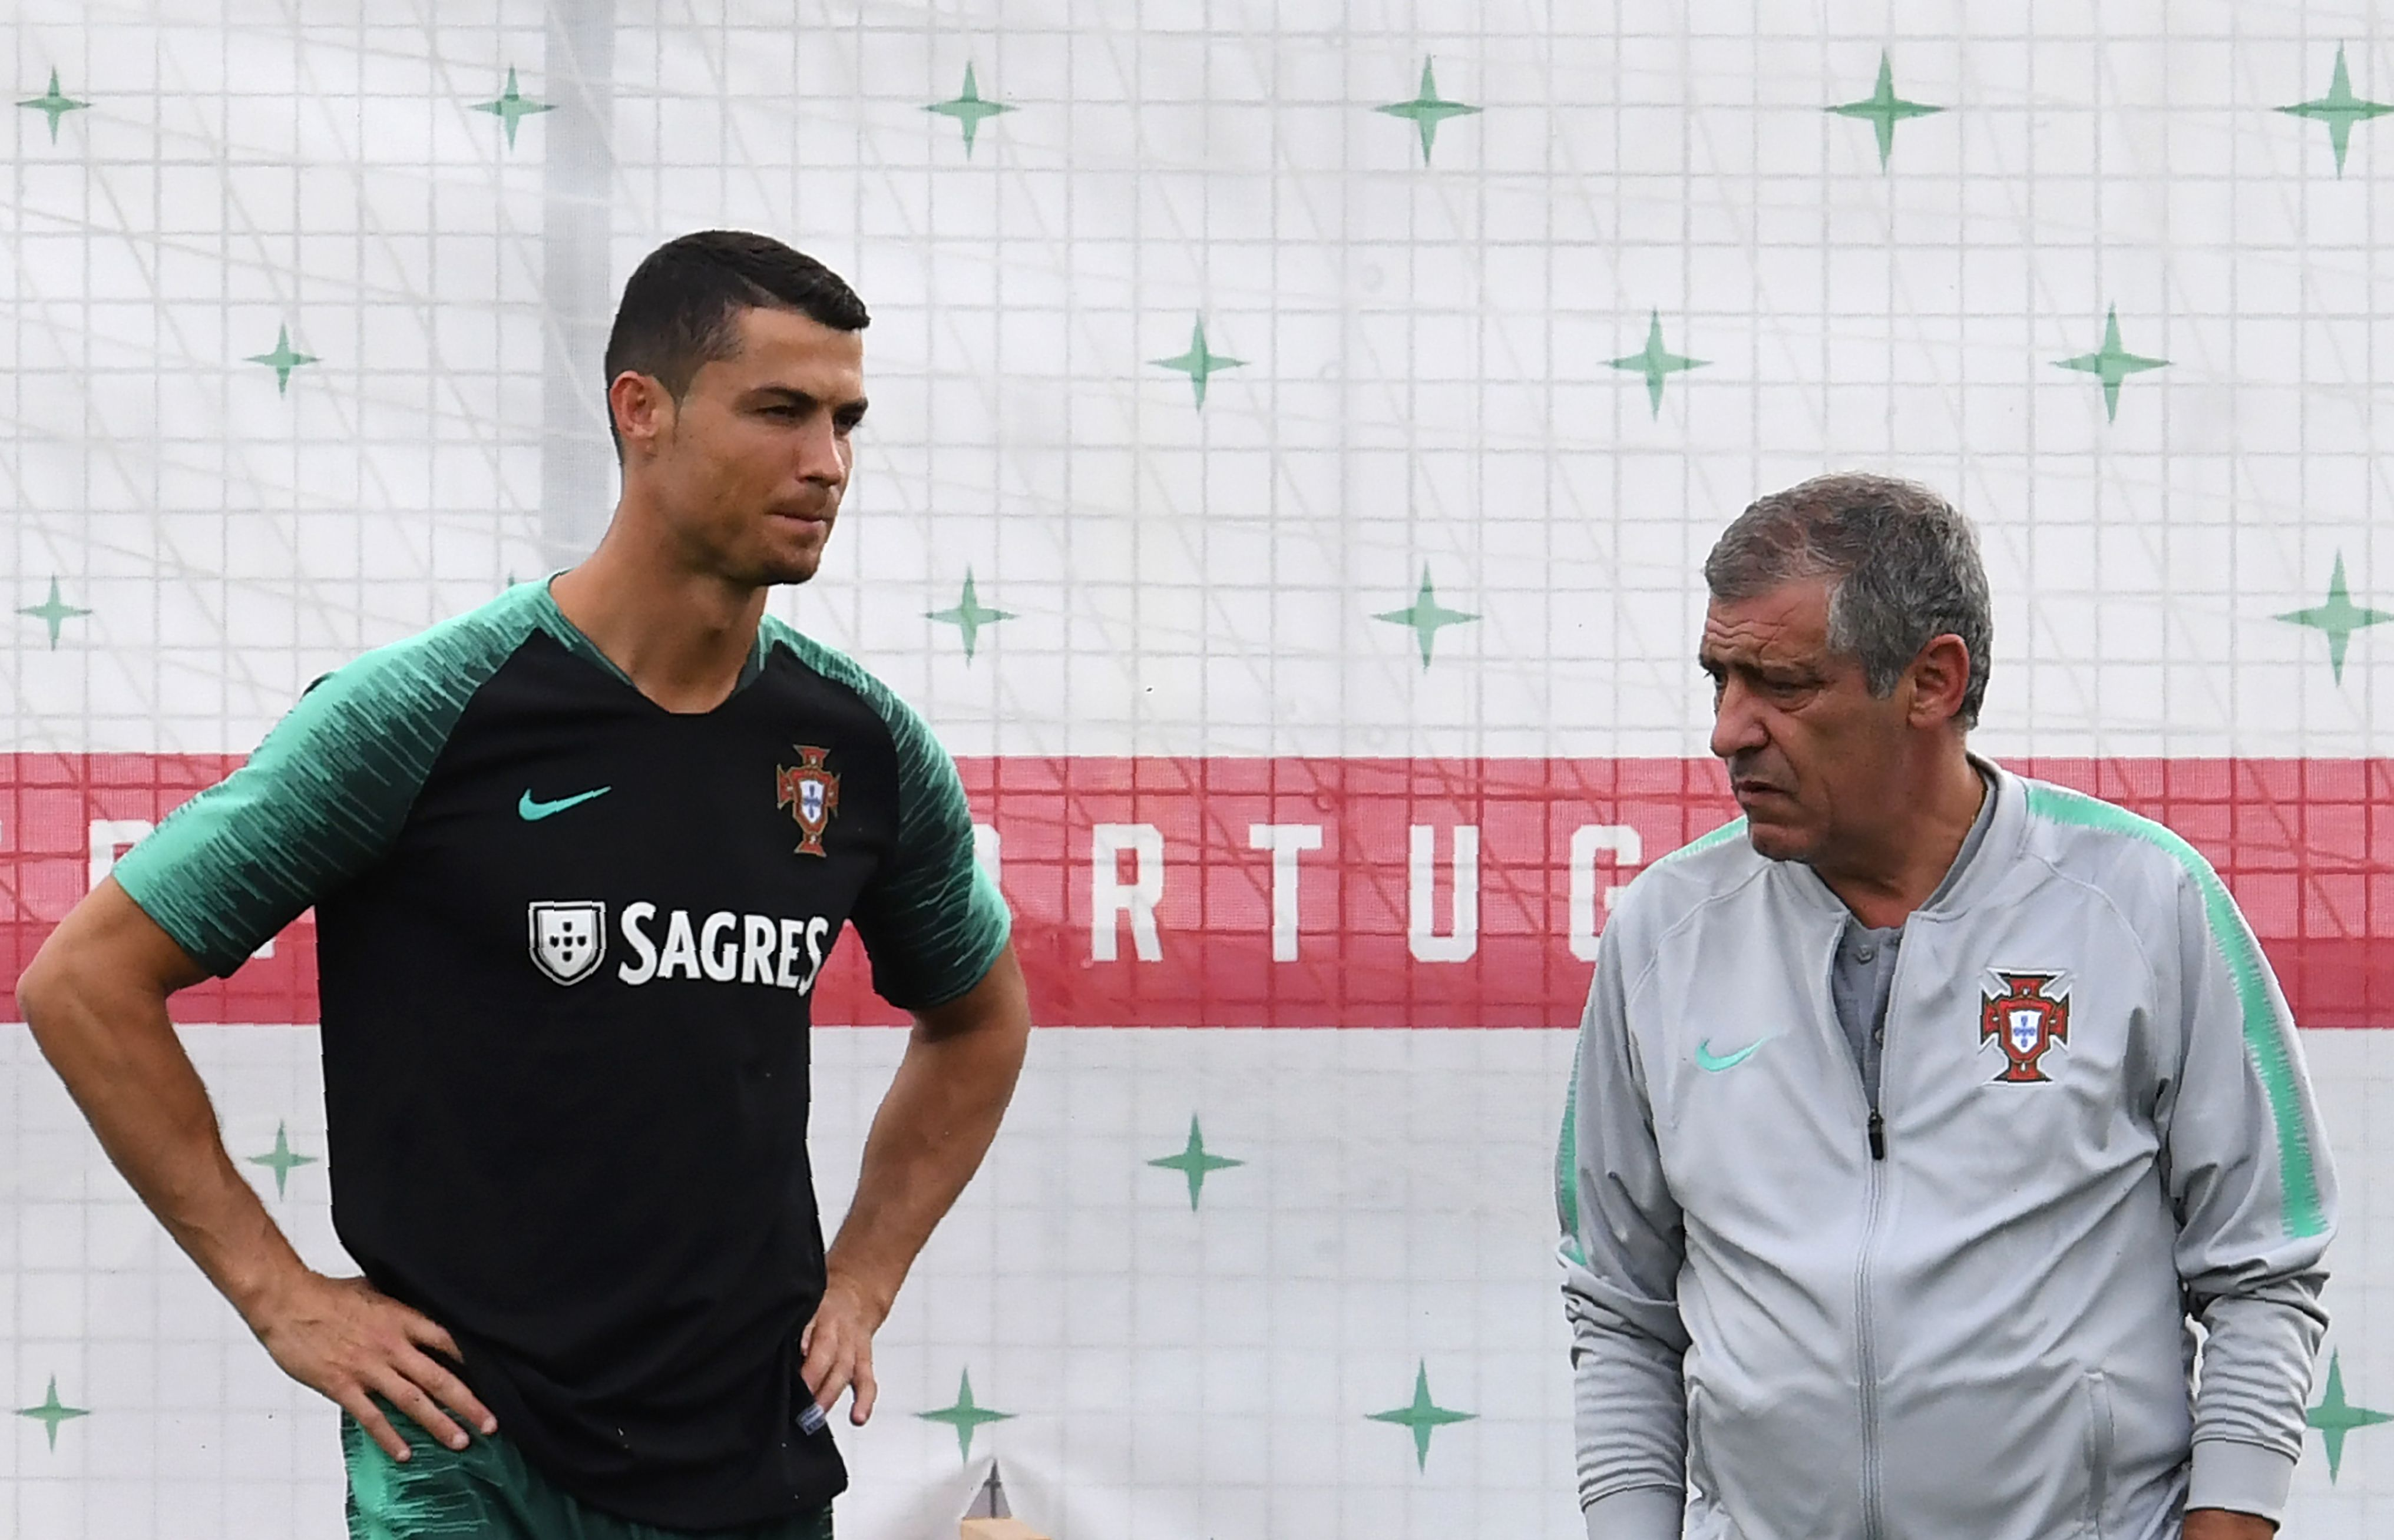 Ronaldo World Cup 2018